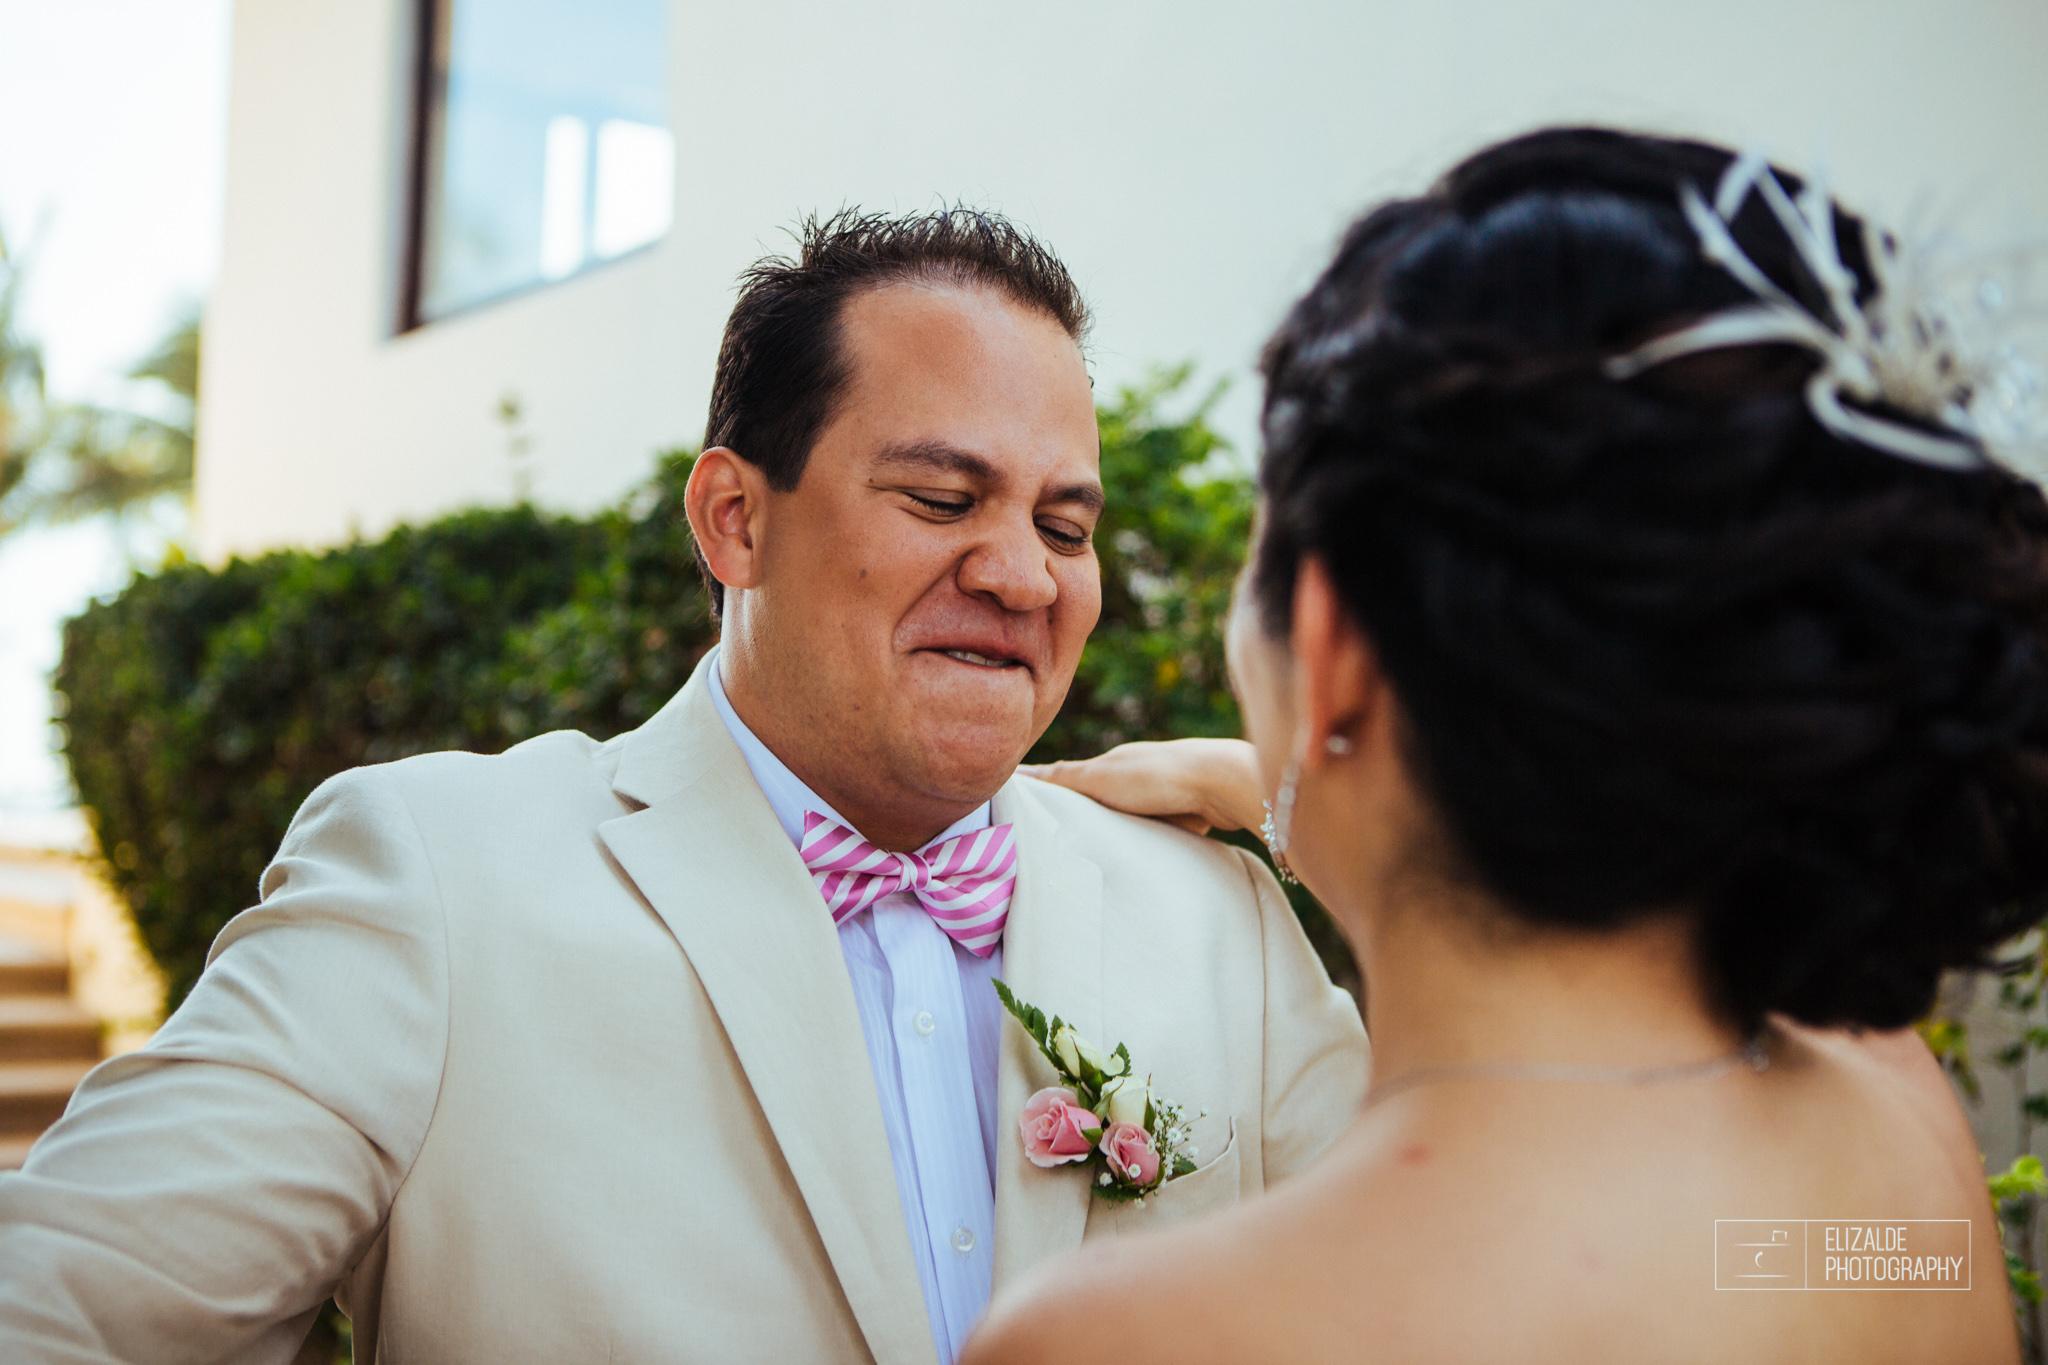 Pay and Ferran_Acapulco_Destination Wedding_Elizalde Photography-62.jpg